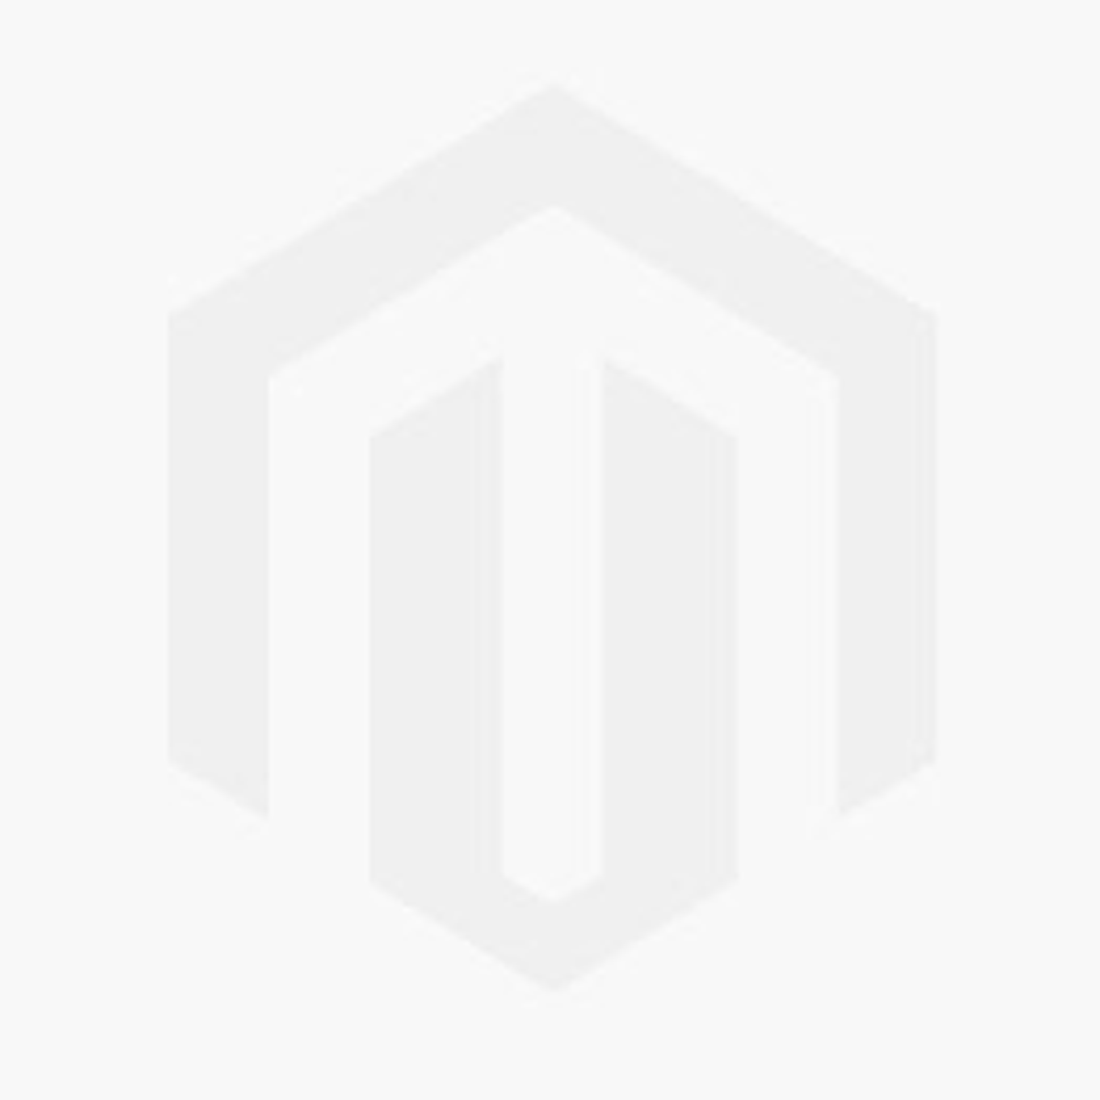 Greetings Card Trevelyan Sailing Boats and Bridge